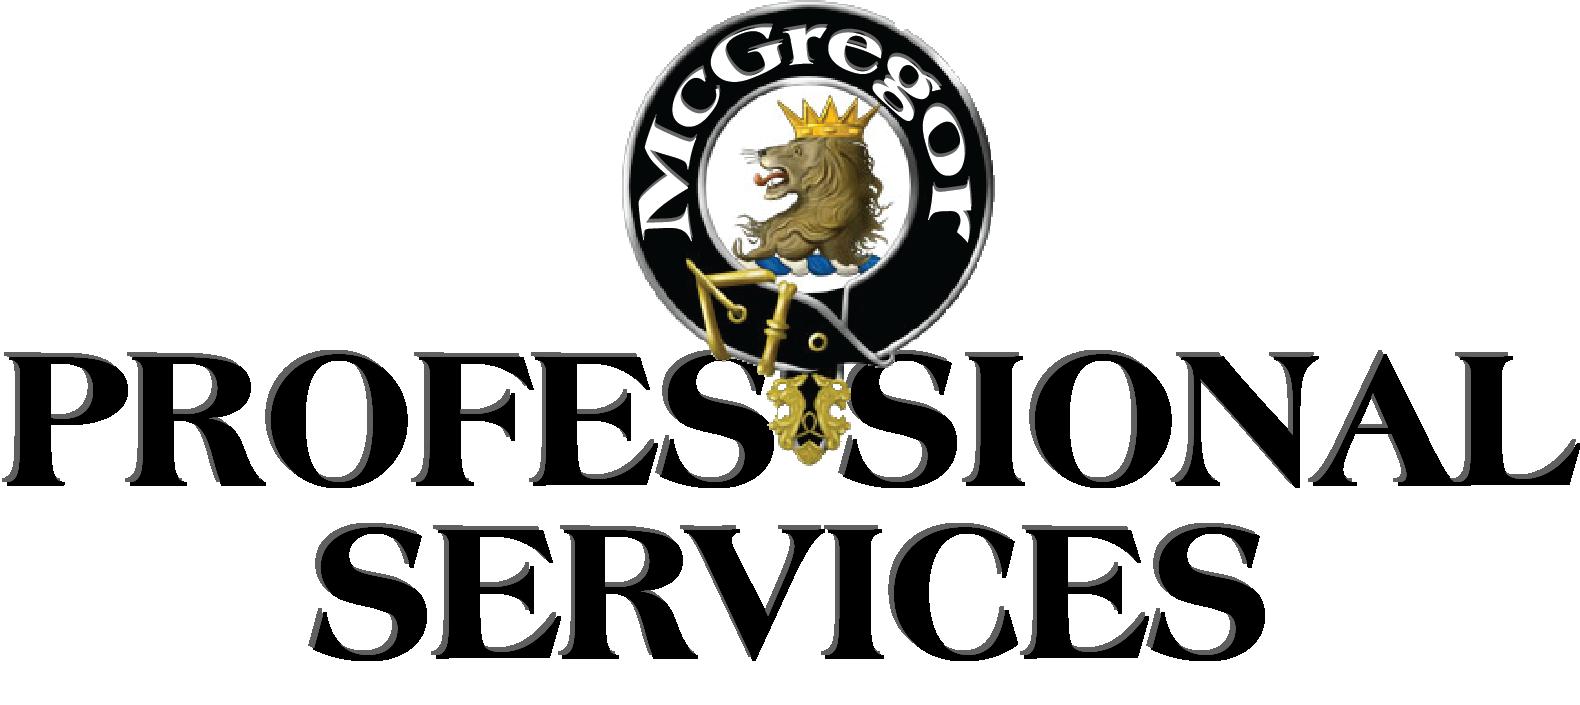 Mcgregor professional service